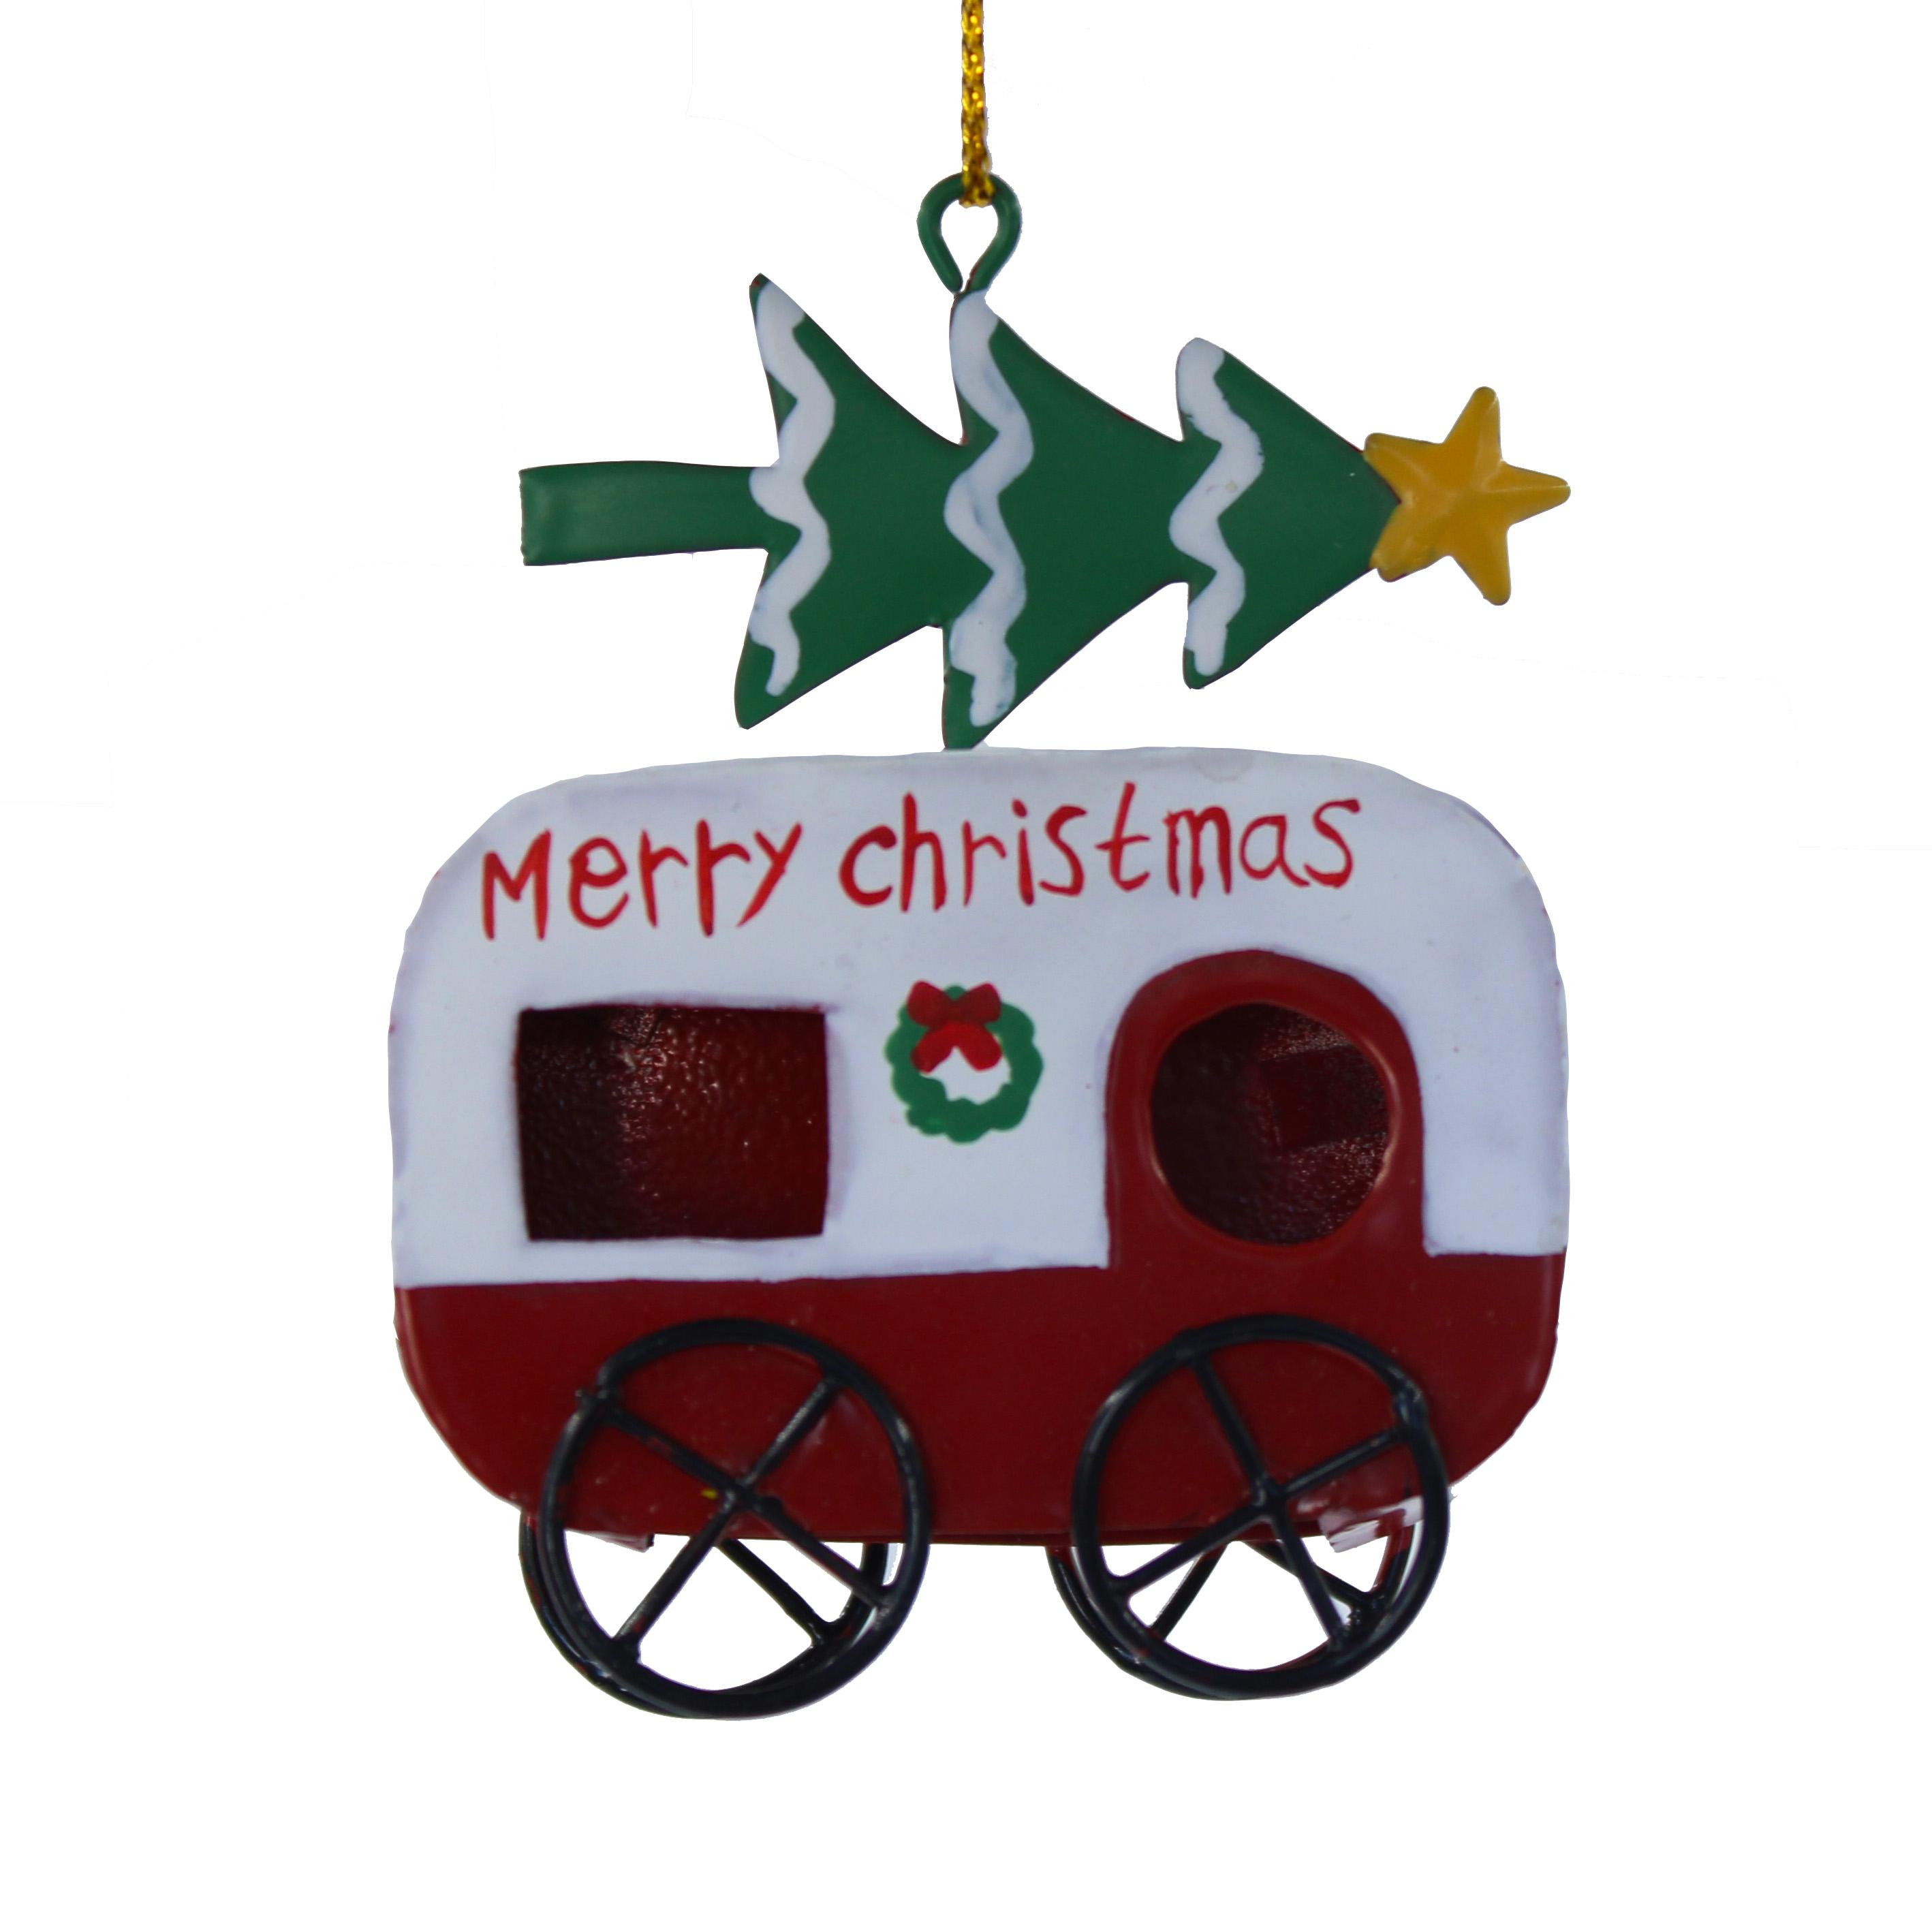 18072 | The Christmas Heirloom Company | Christmas Decorations